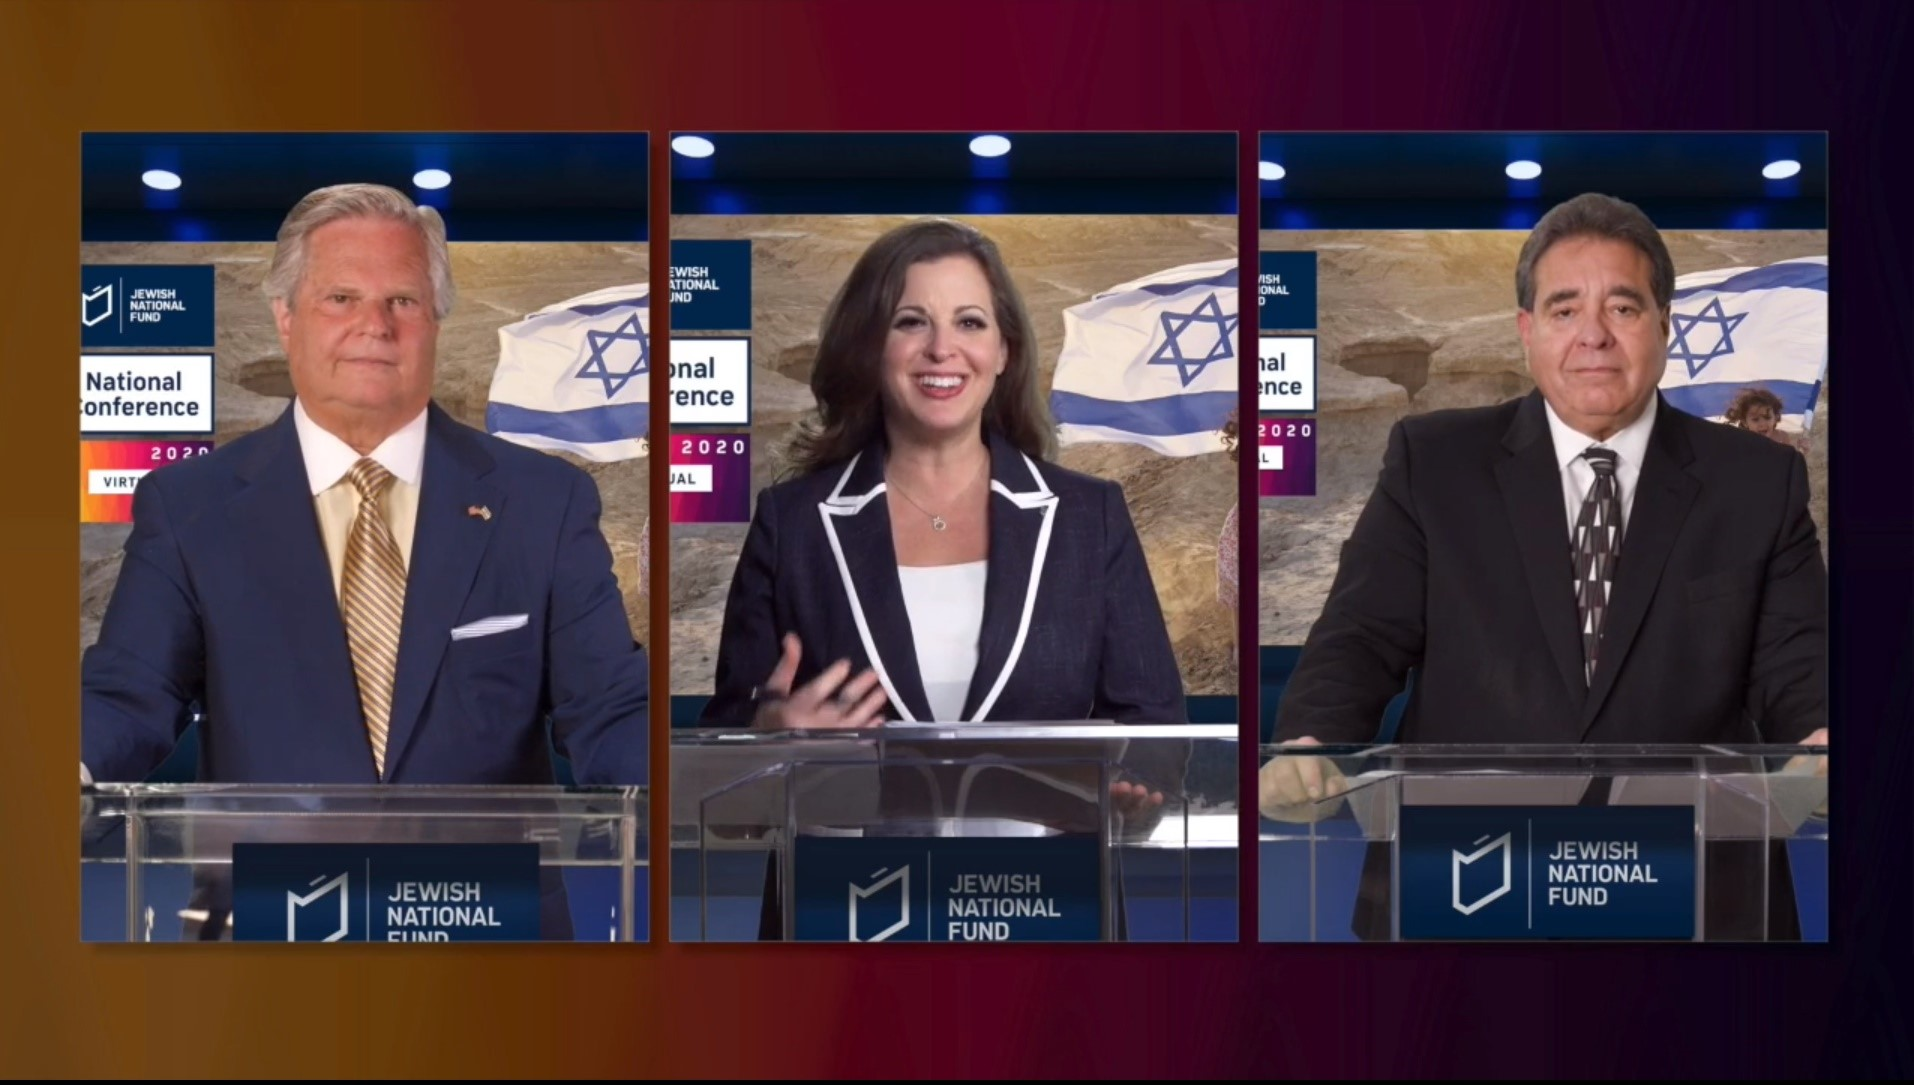 virtual conference main screen